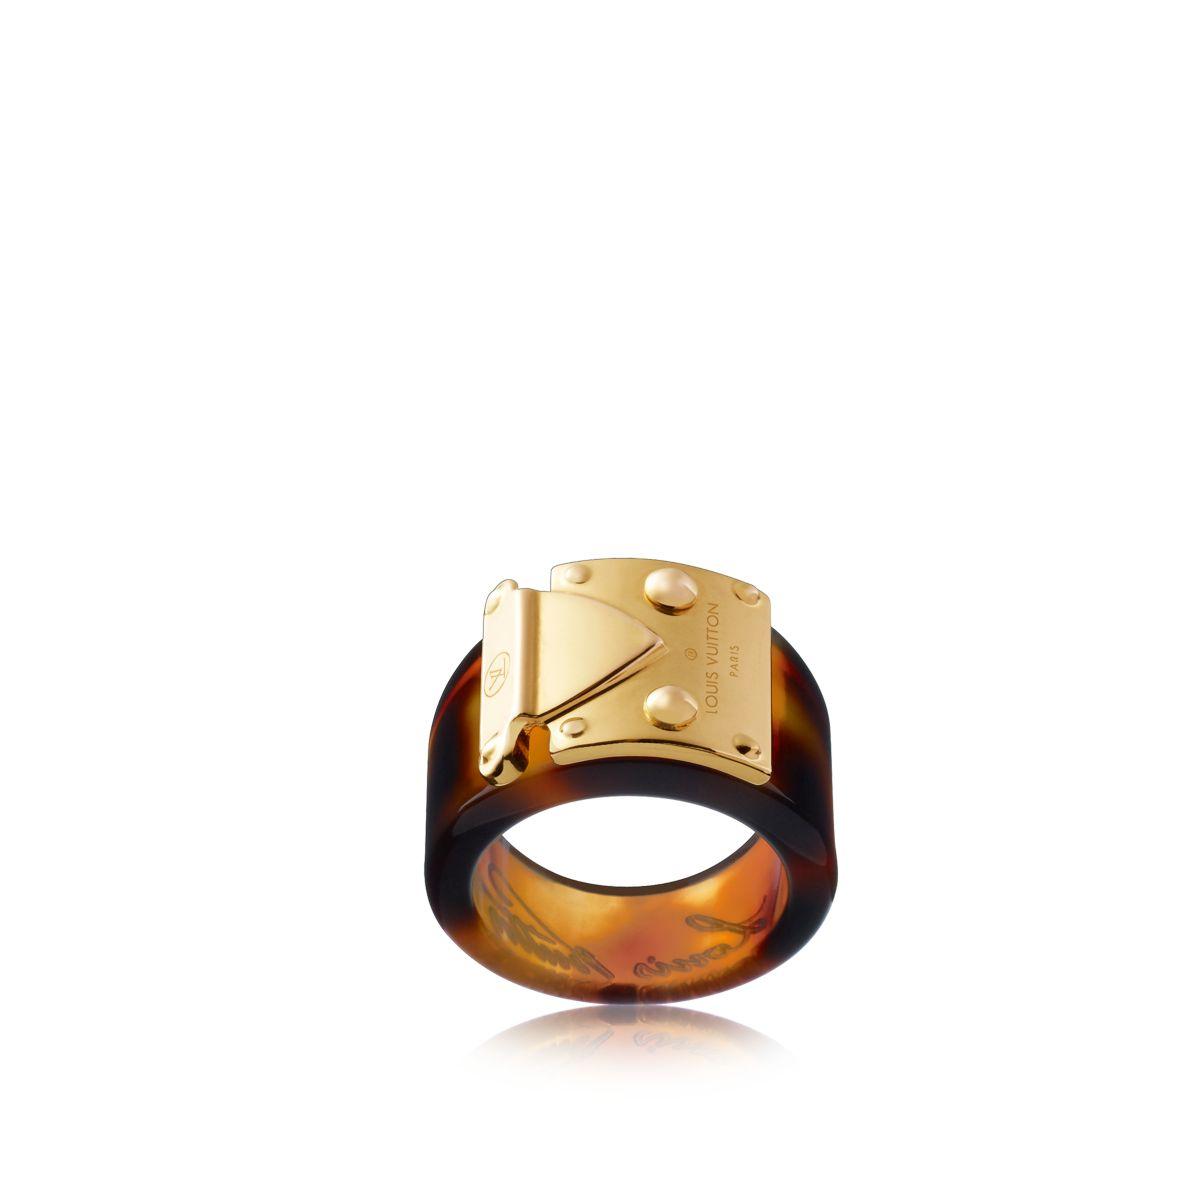 Repossi Ring Replica